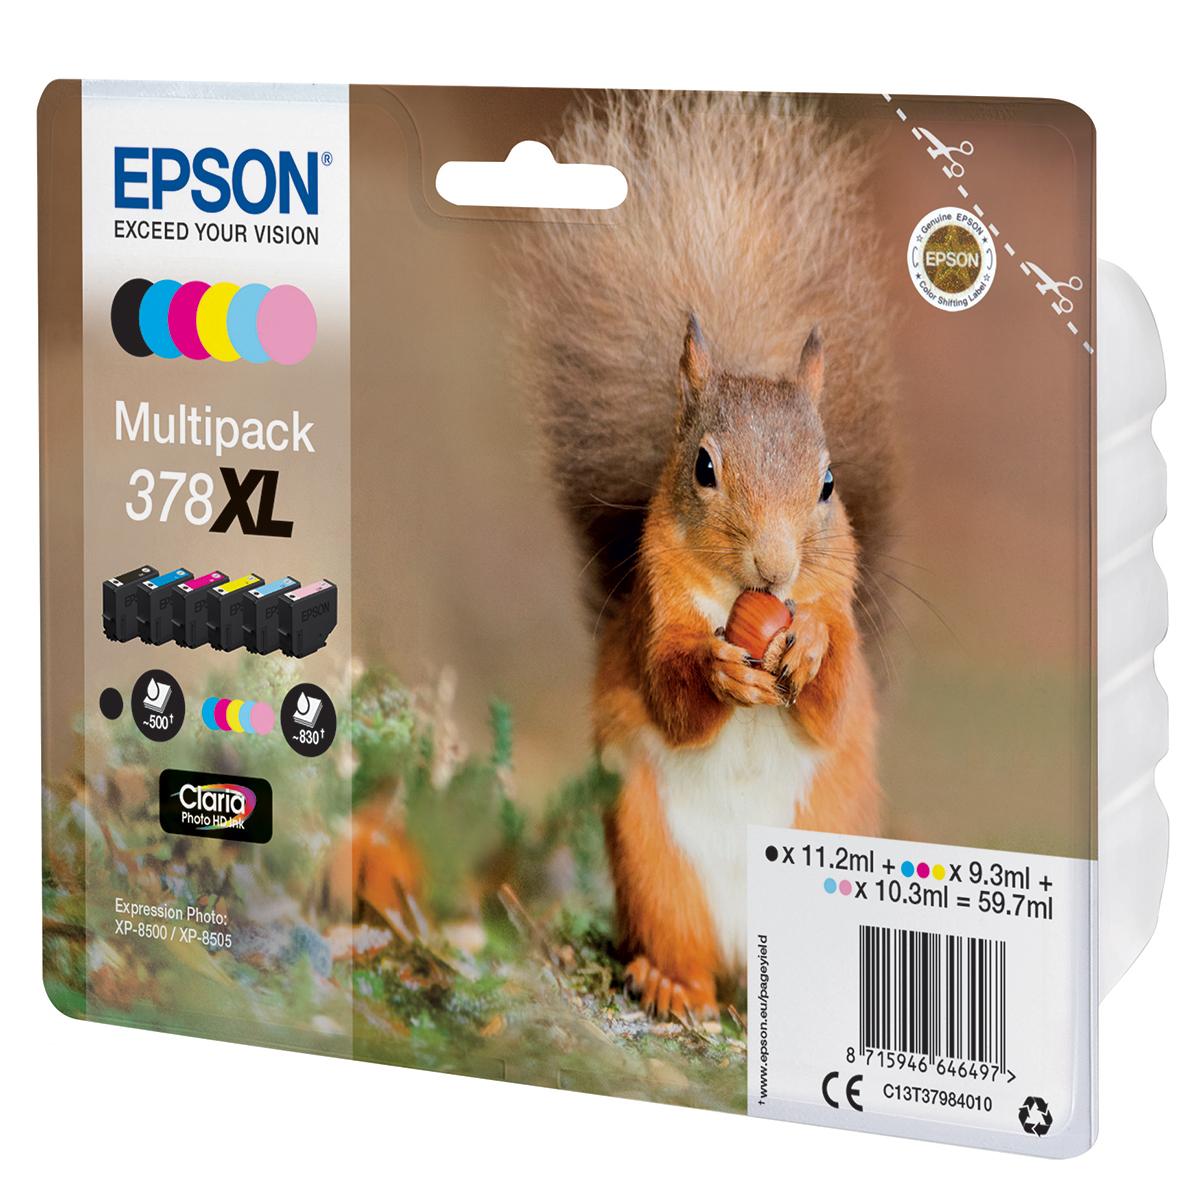 Epson 378XL Multipack 6 Ink Photo HD Cartridges